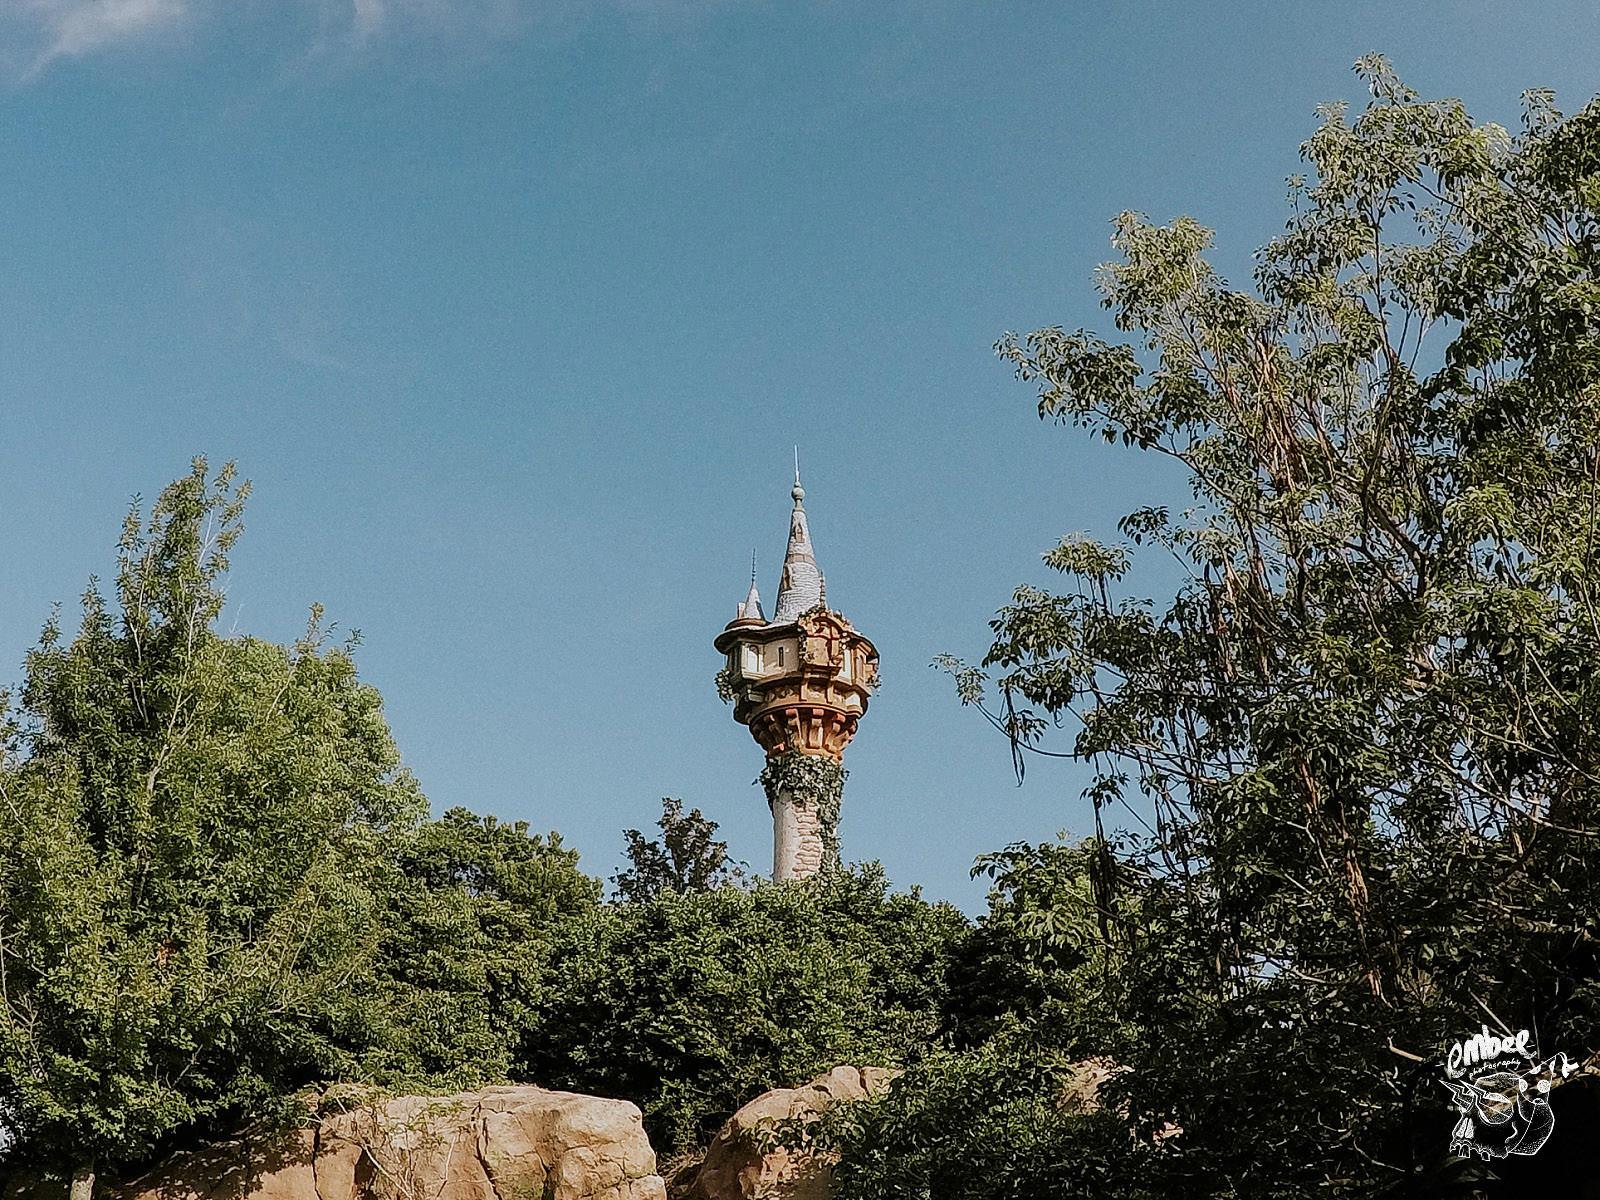 repunzels tower in magic kingdom